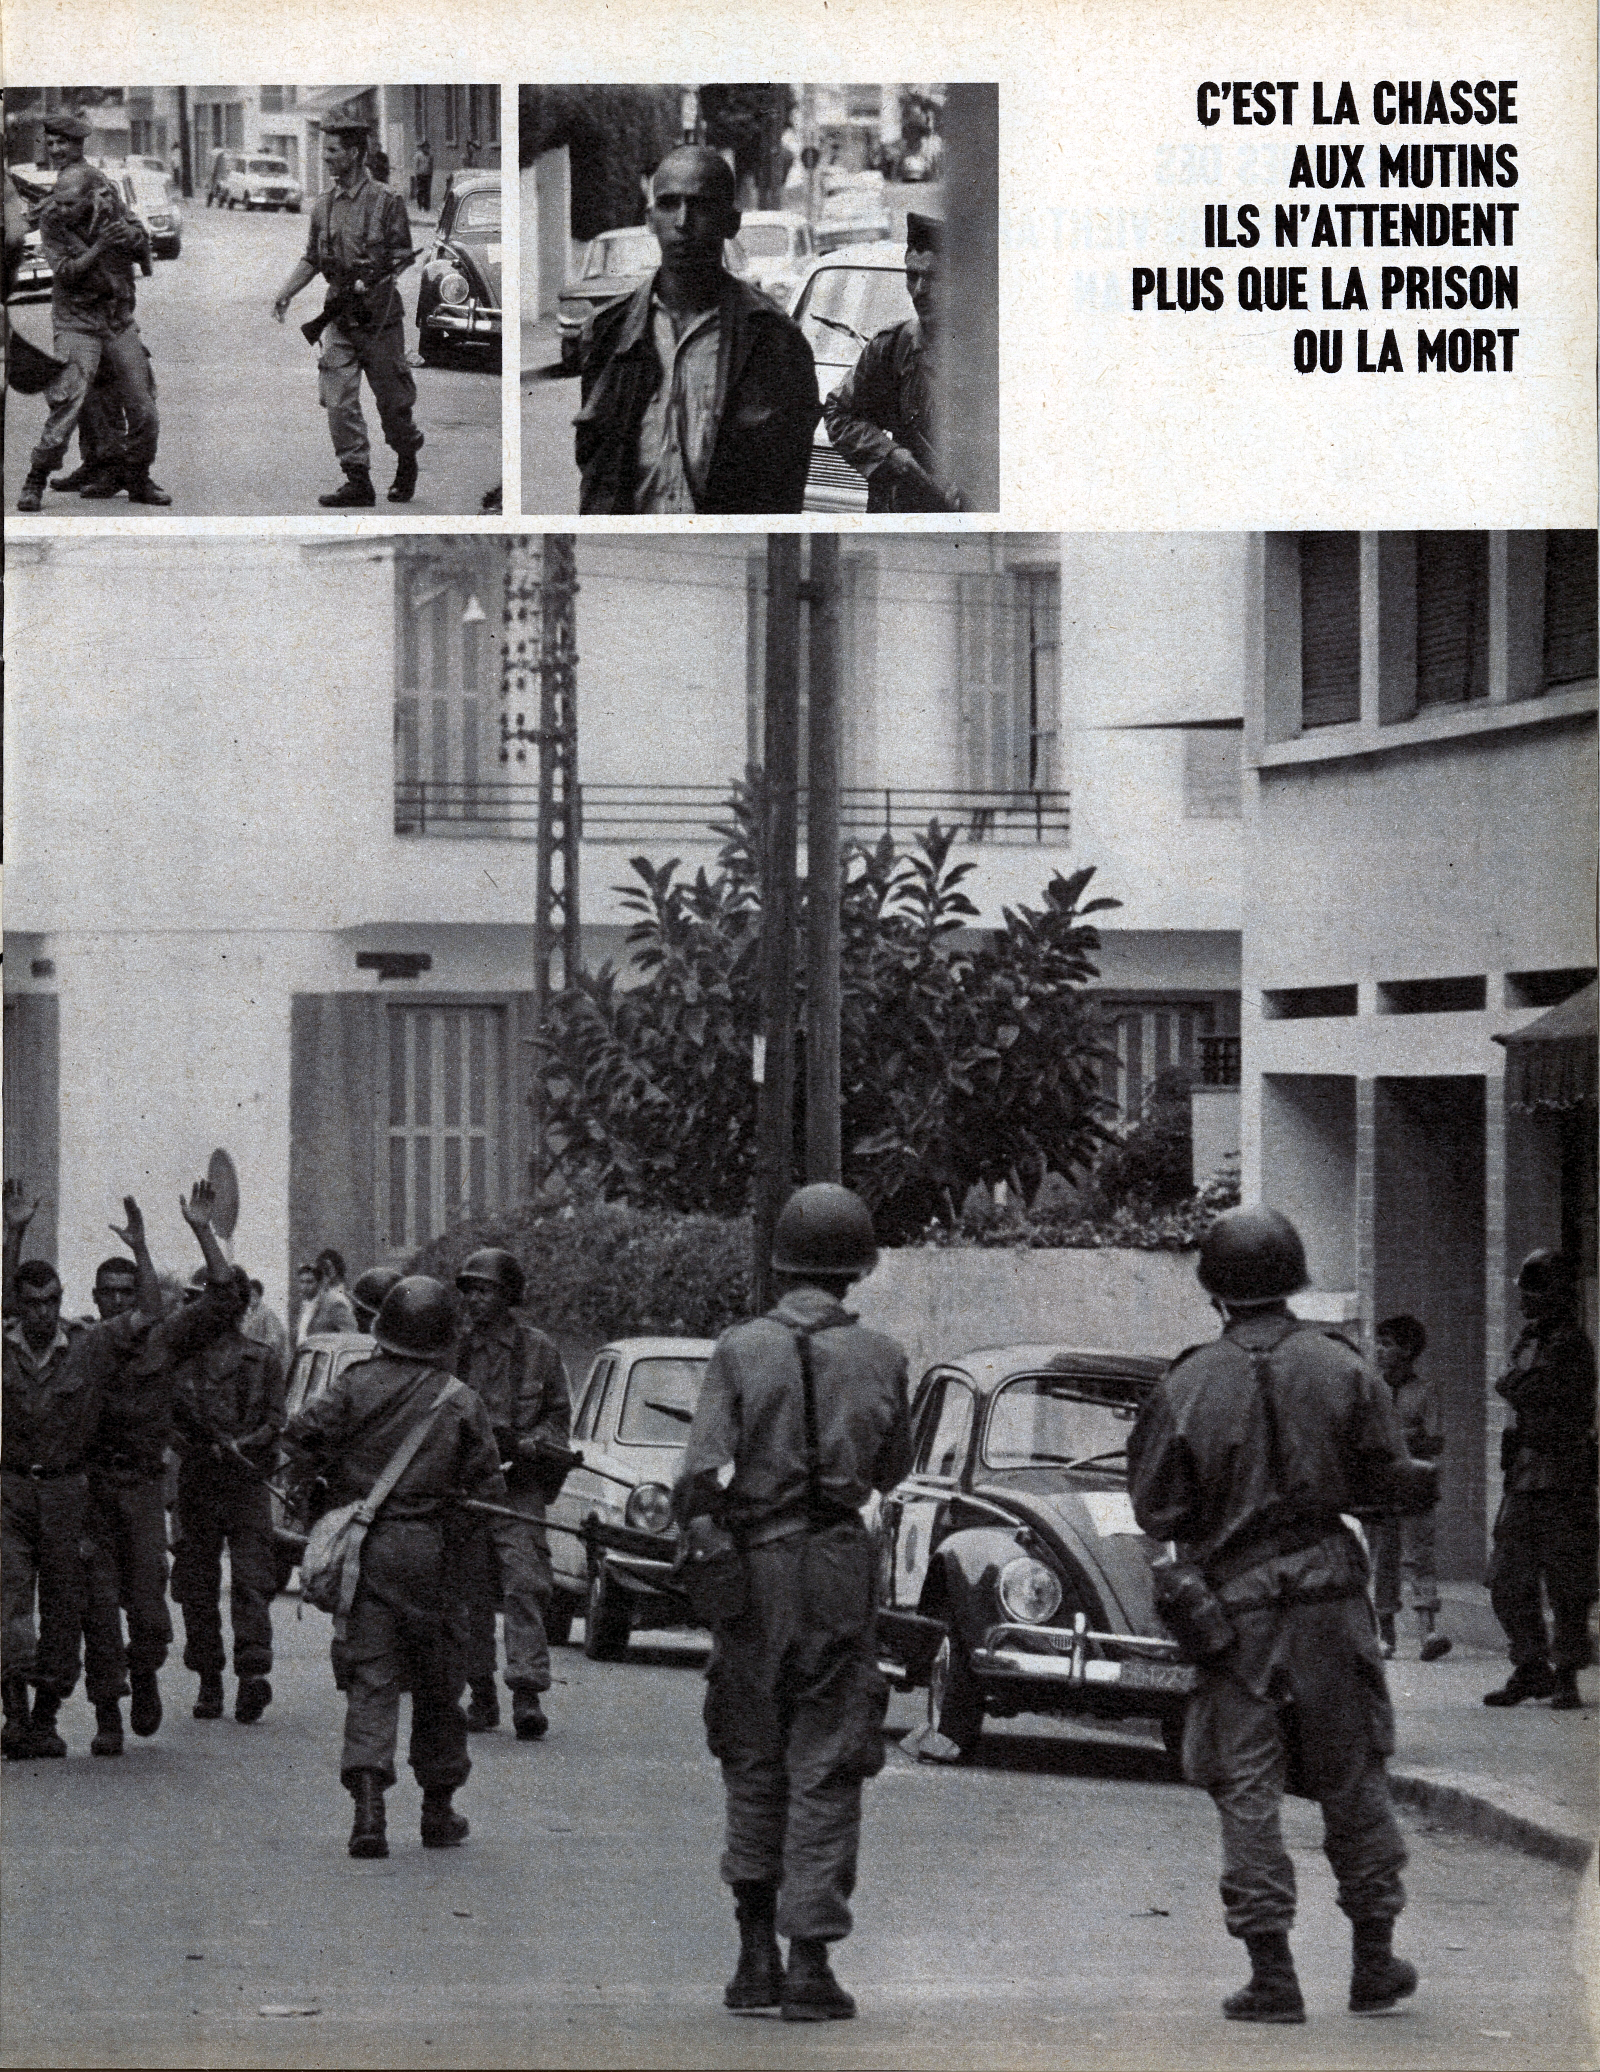 Tentative de coup d'État à Rabat et Skhirate le 10 juillet 1971  48695306493_037f6c1c7e_o